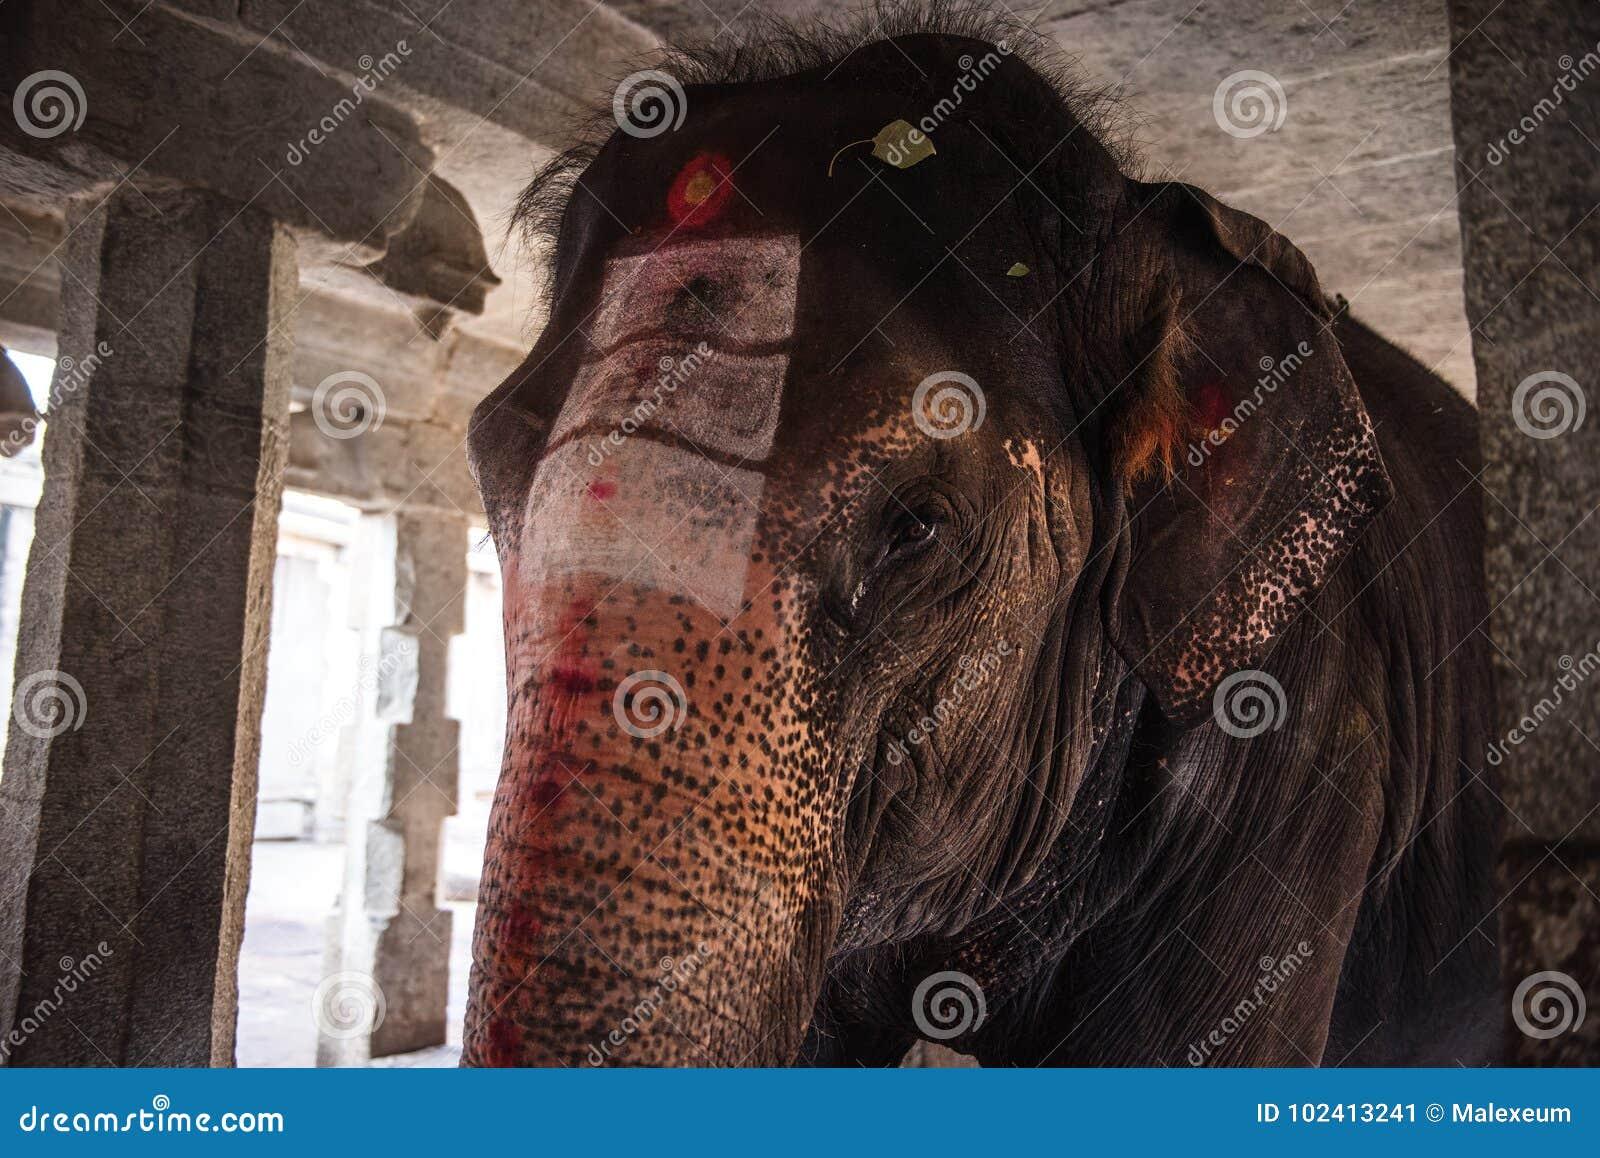 Elephant in a Hindu Virupaksha Temple.